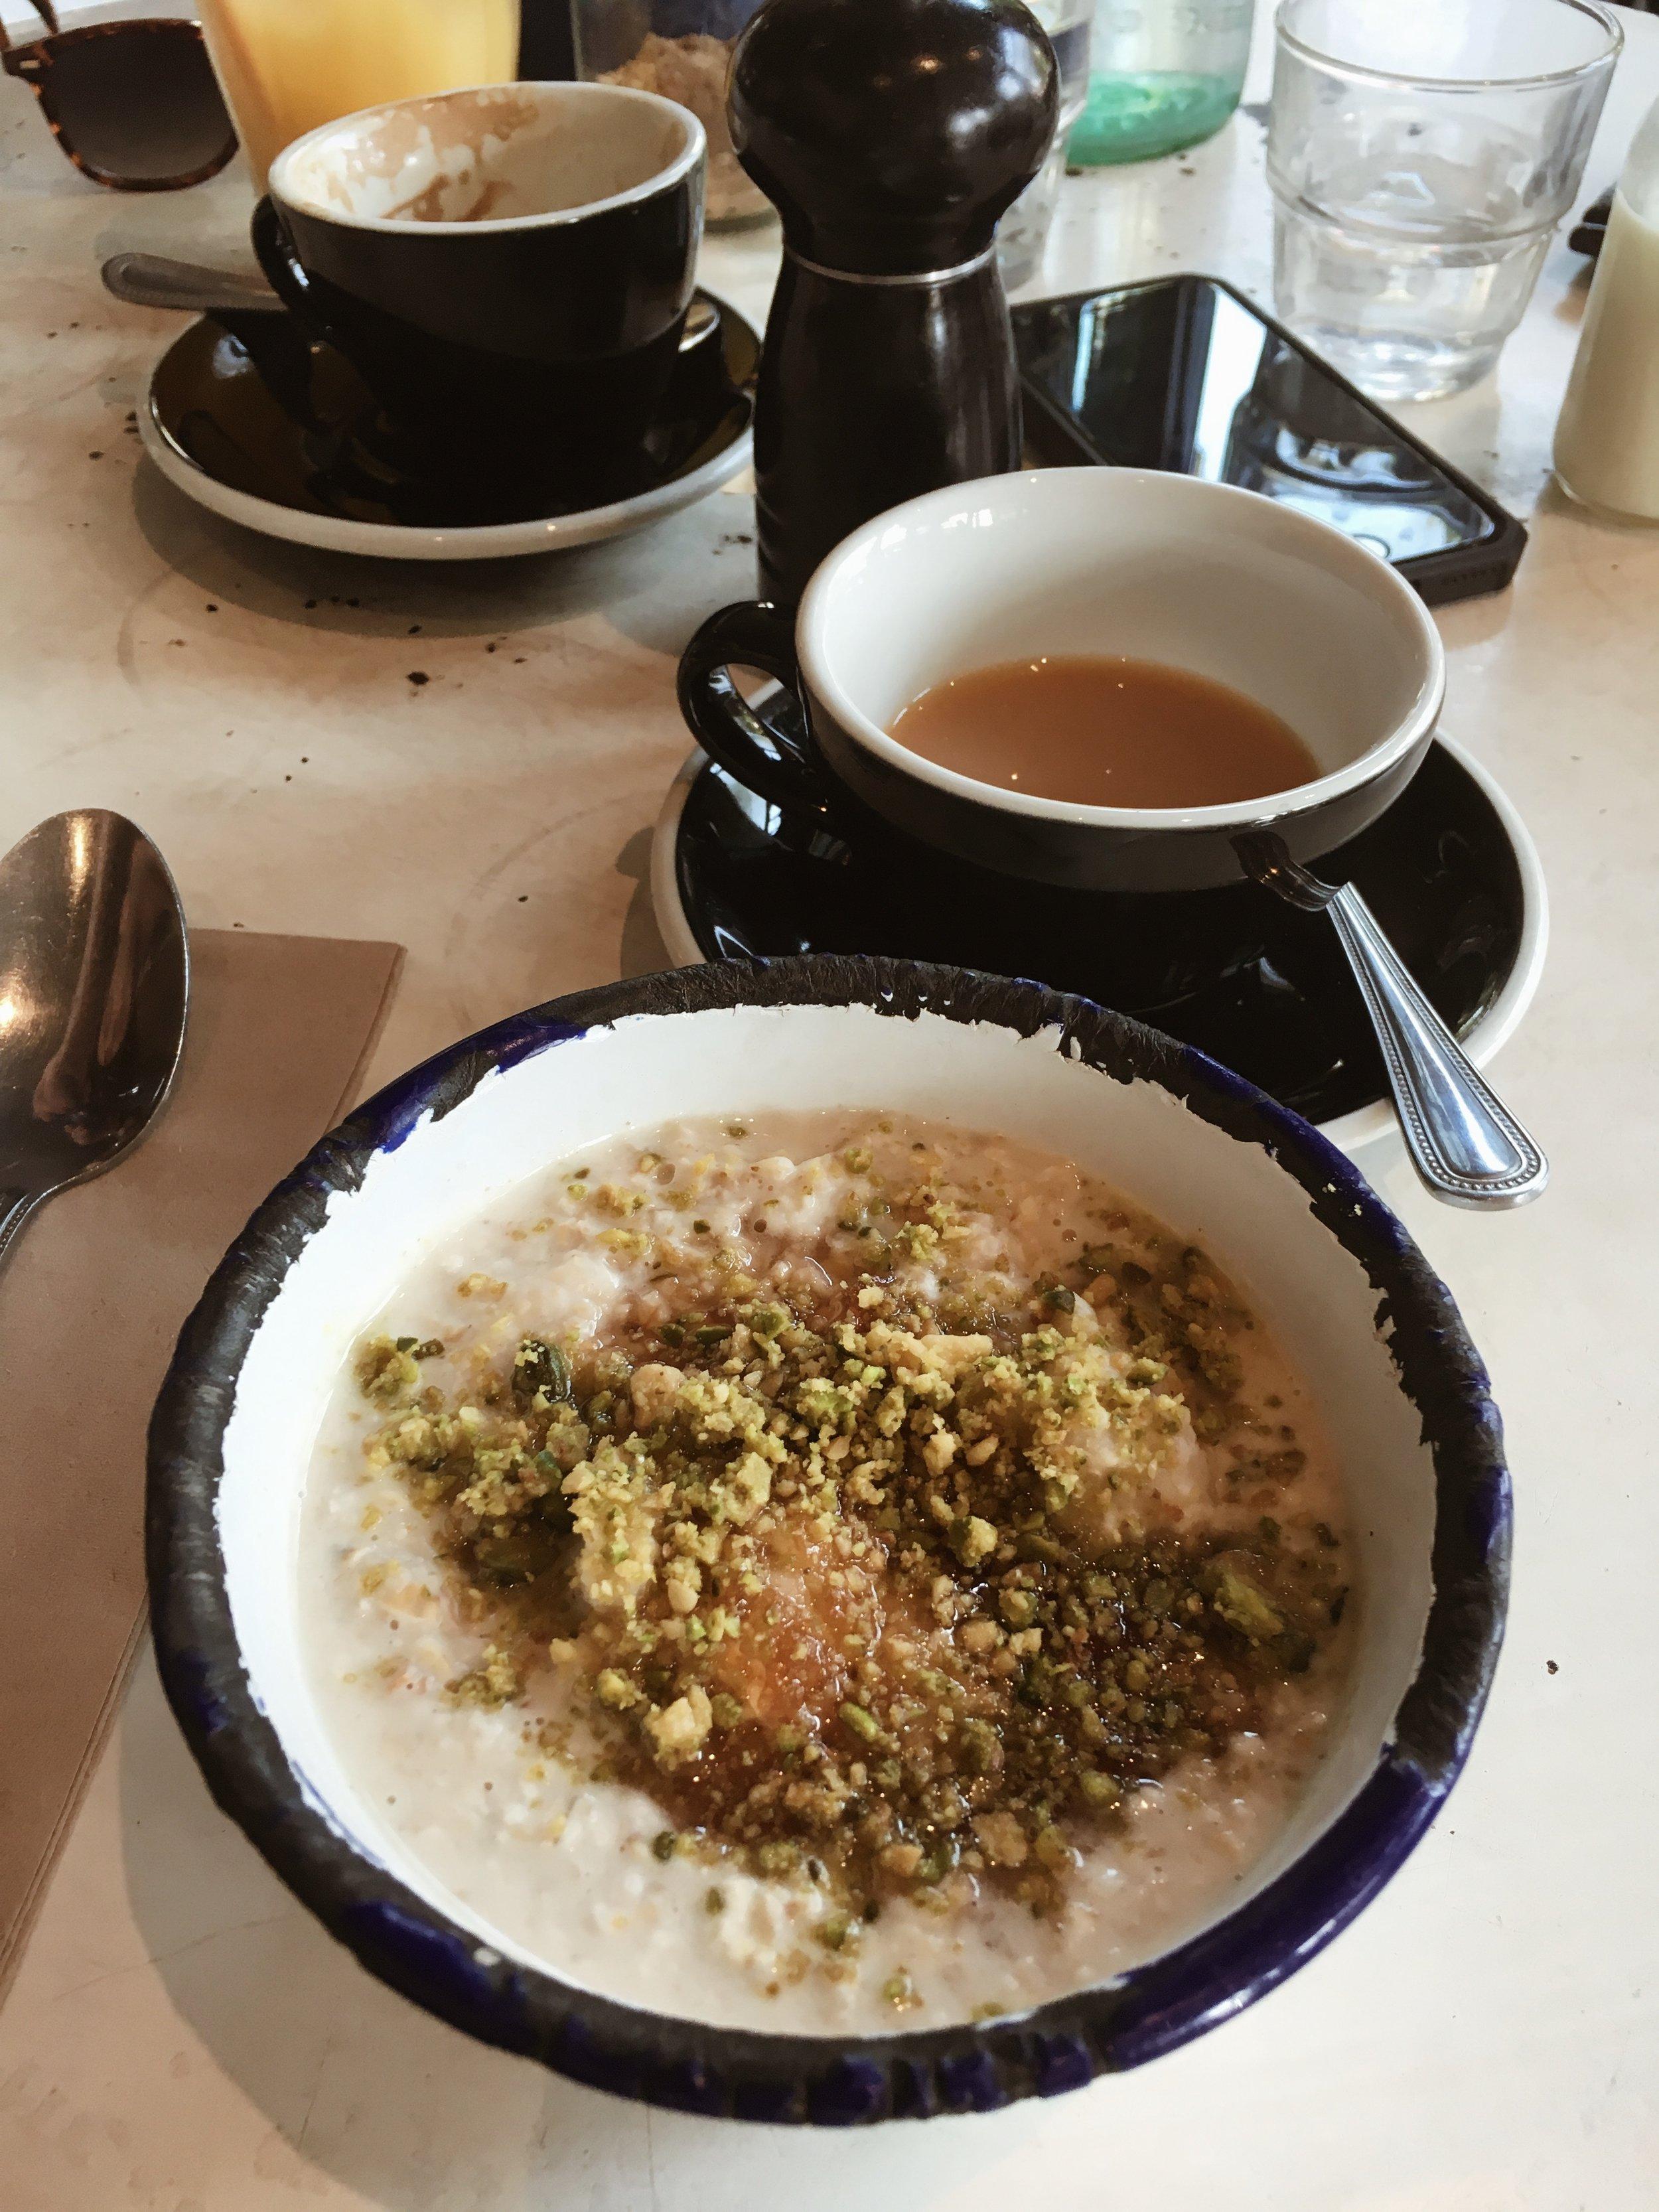 The Elgin - Maida Vale Cafe